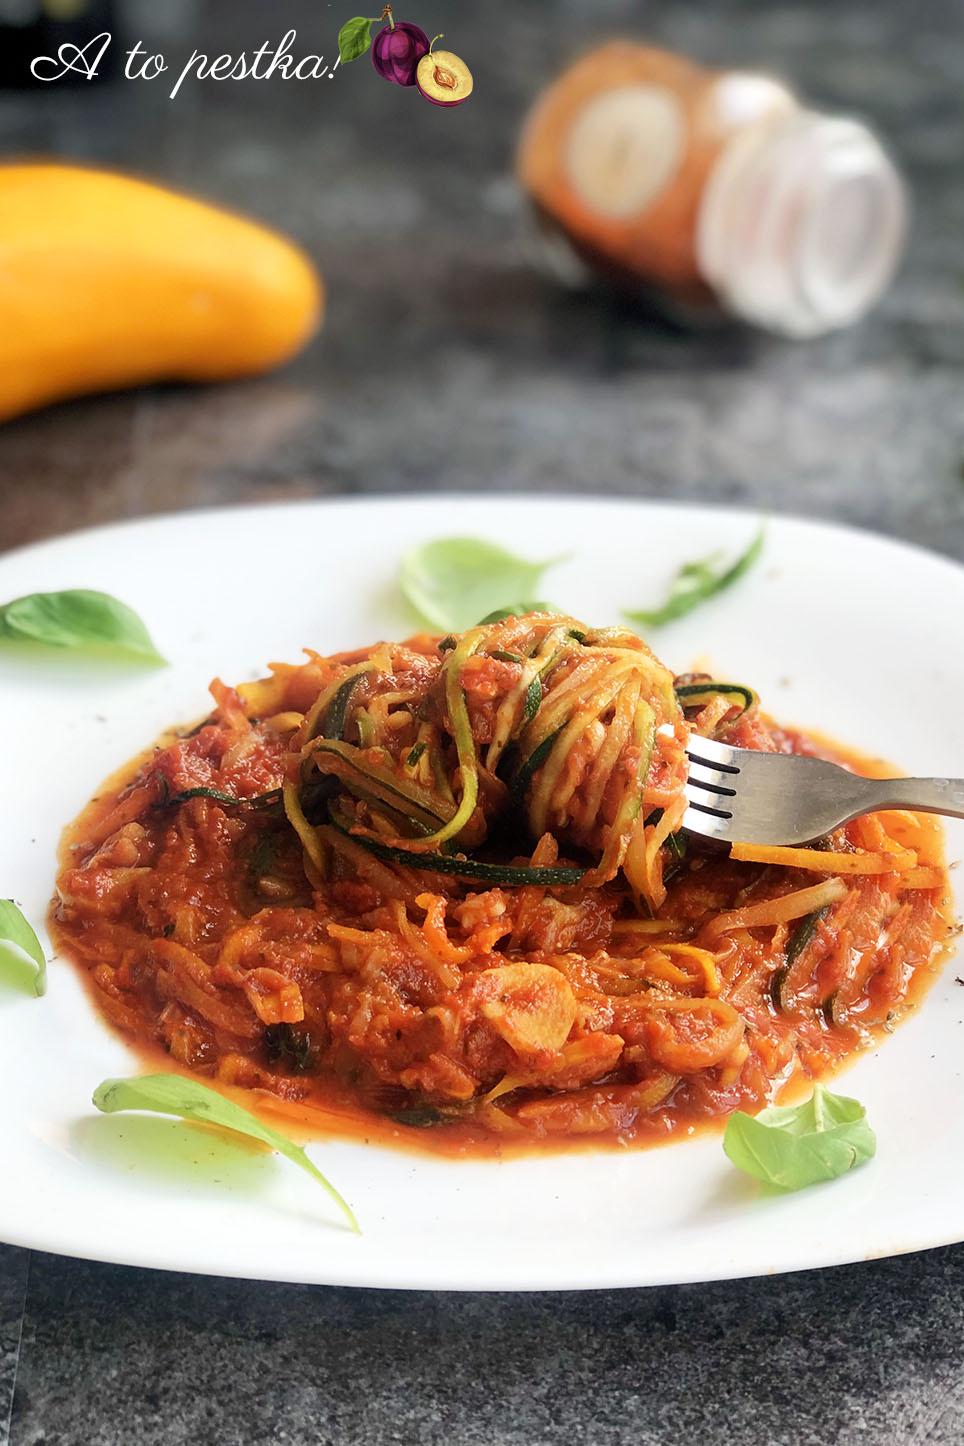 Szybki przepis na cukinię - fit spaghetti napoli